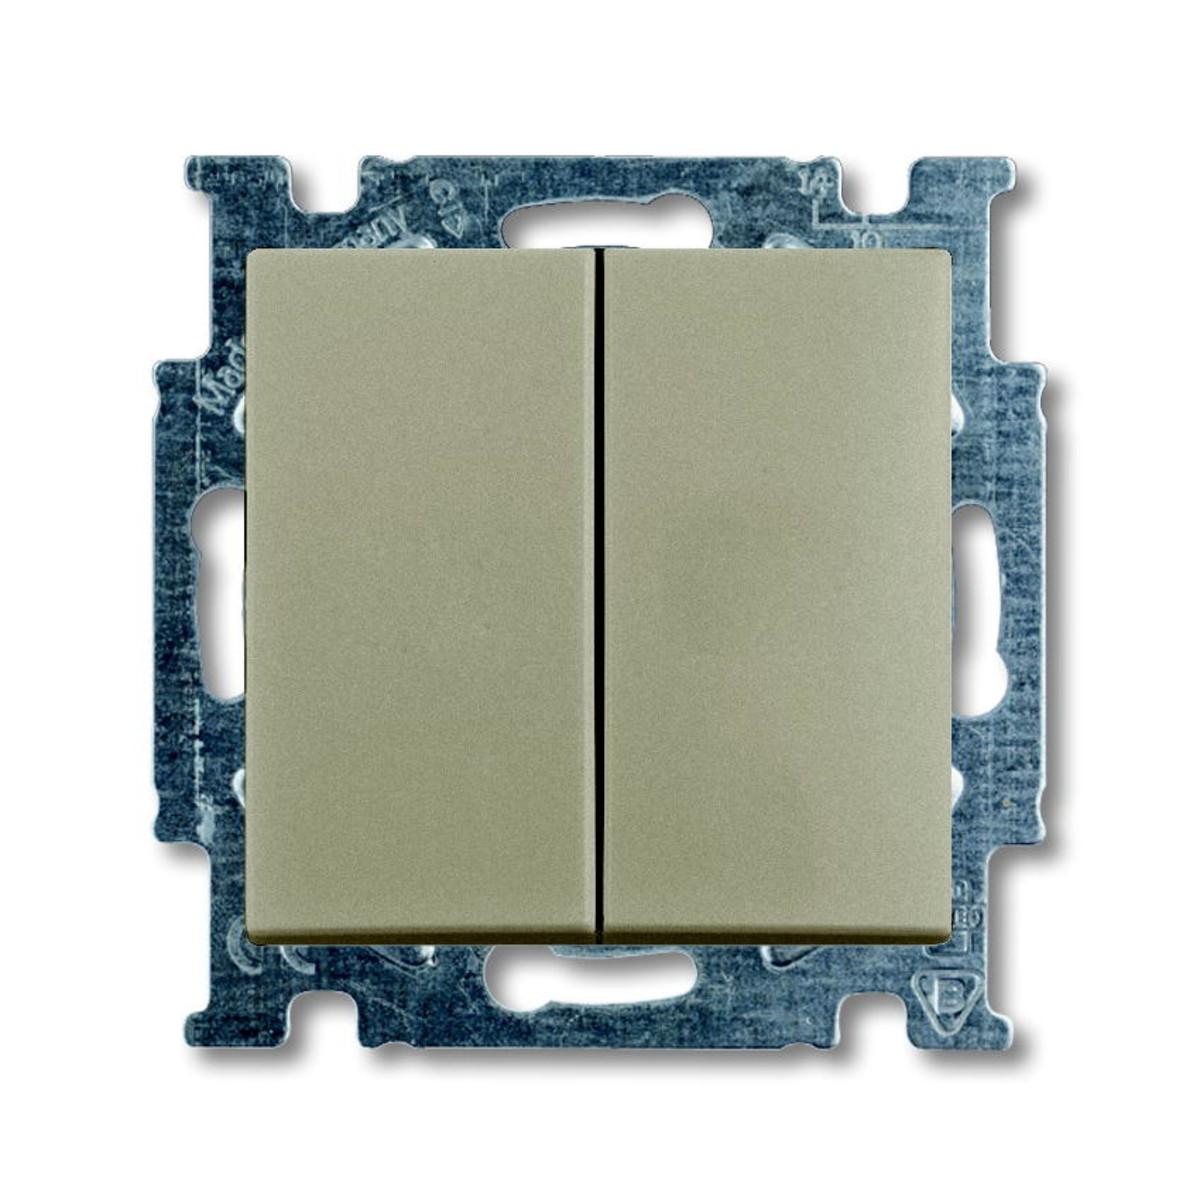 Выключатель ABB Basic 55 2006/5 UC-93-5